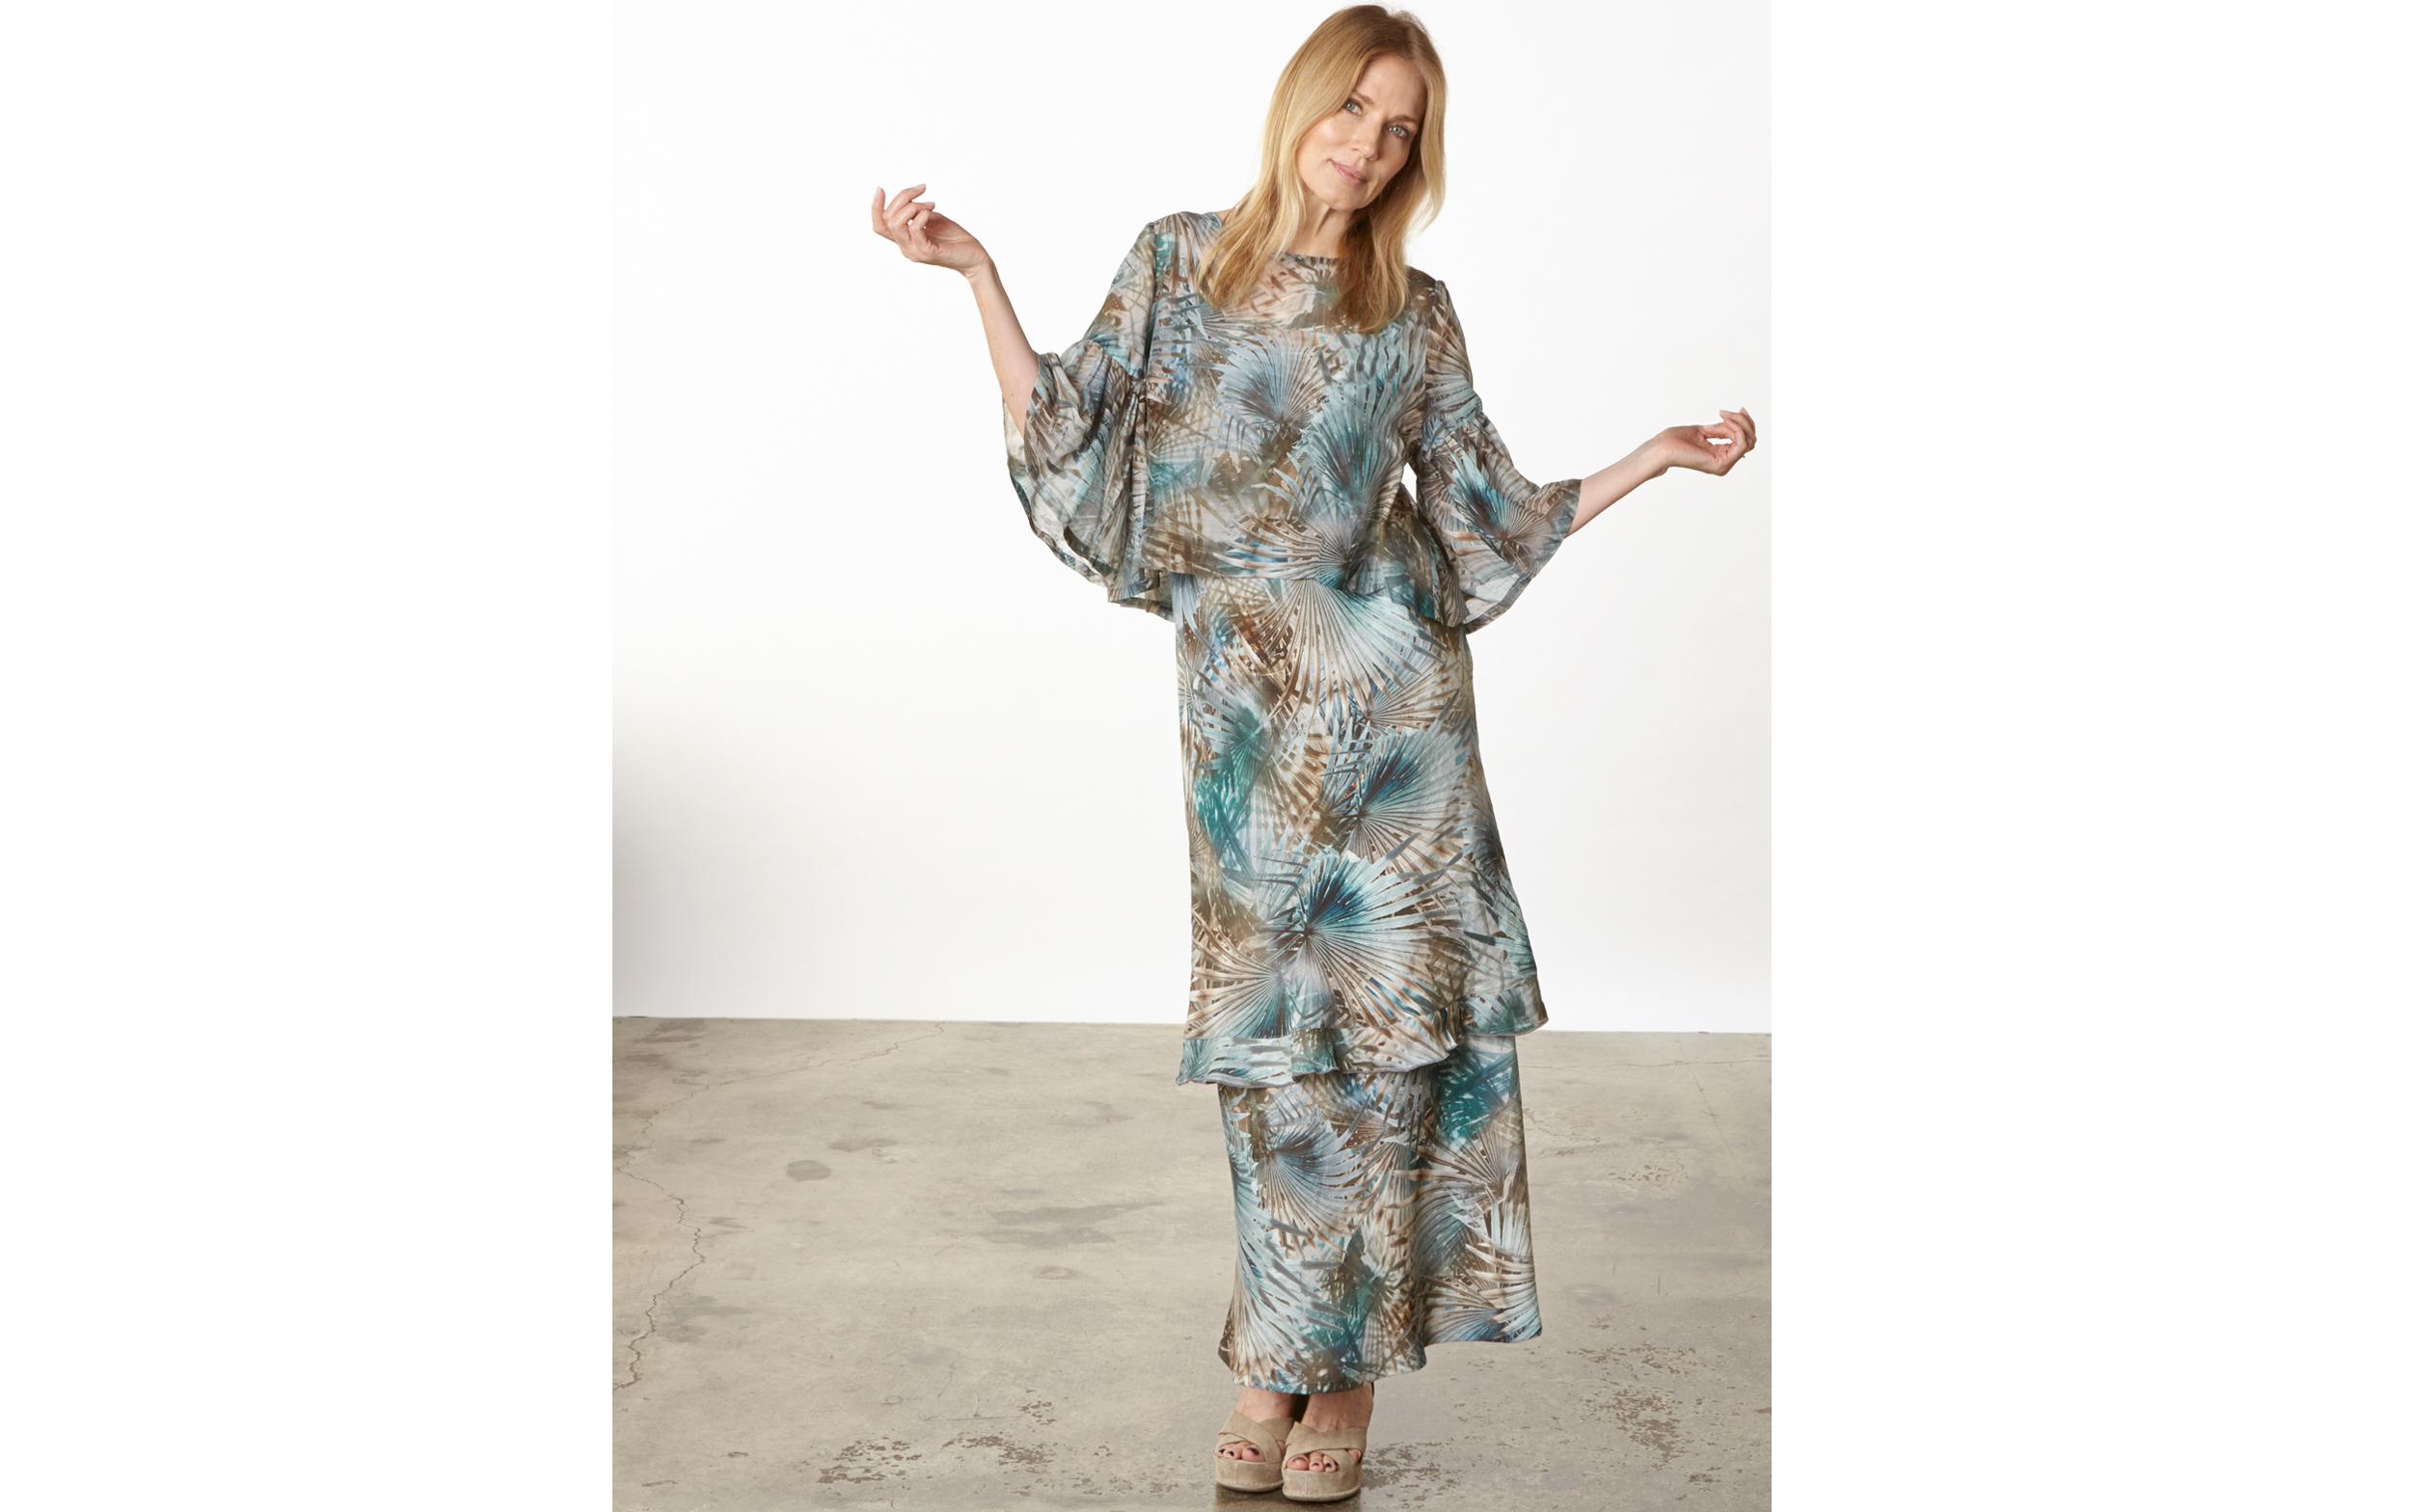 Frida Shirt in Palma Italian Cotton/Silk, Giselle Dress, Long Bias Skirt in Palma Italian Linen